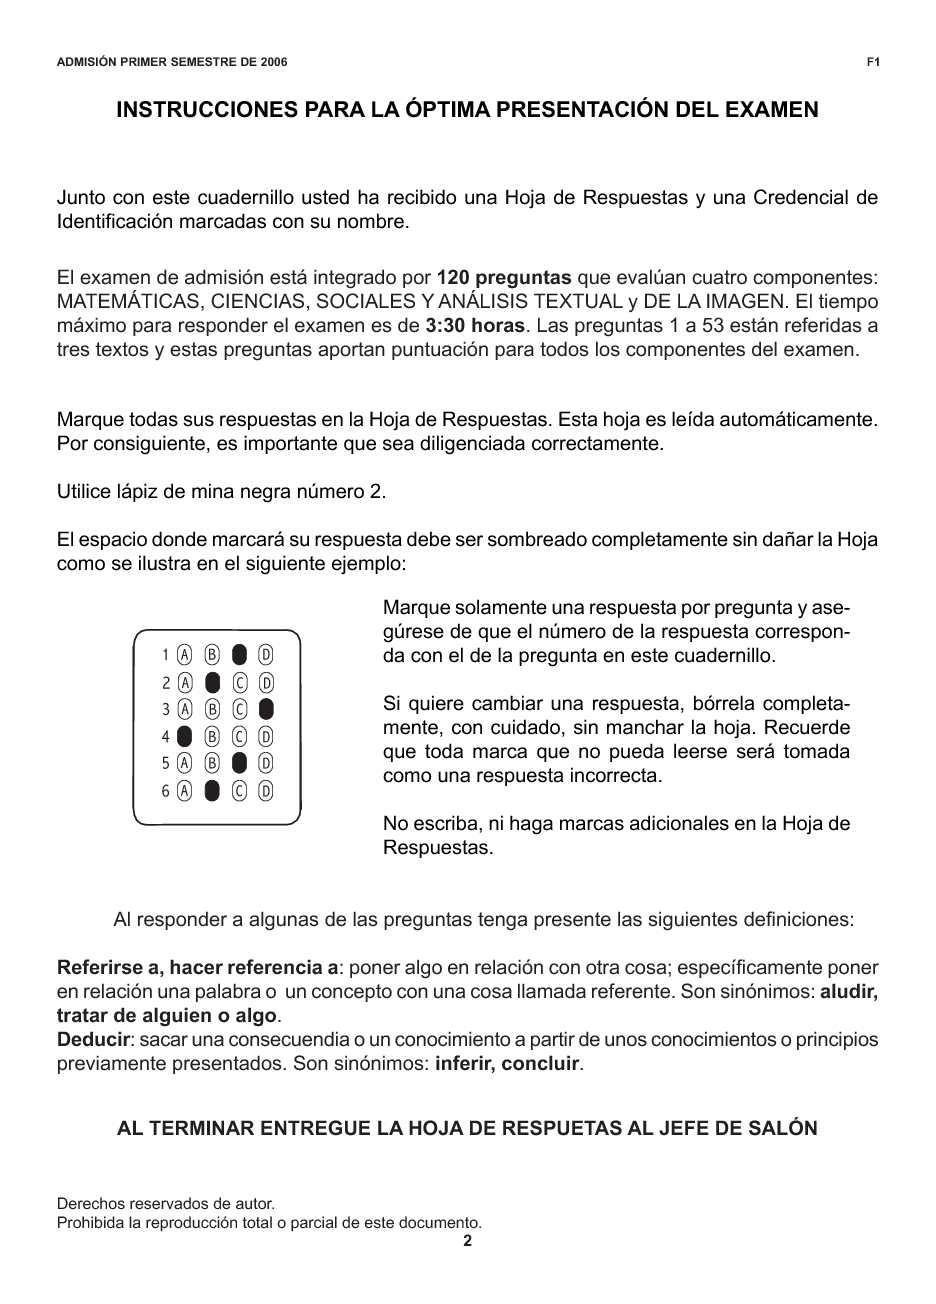 Calaméo - EXAMEN DE ADMISION UNIVERSIDAD NACIONAL 2006 PRIMER SEMESTRE